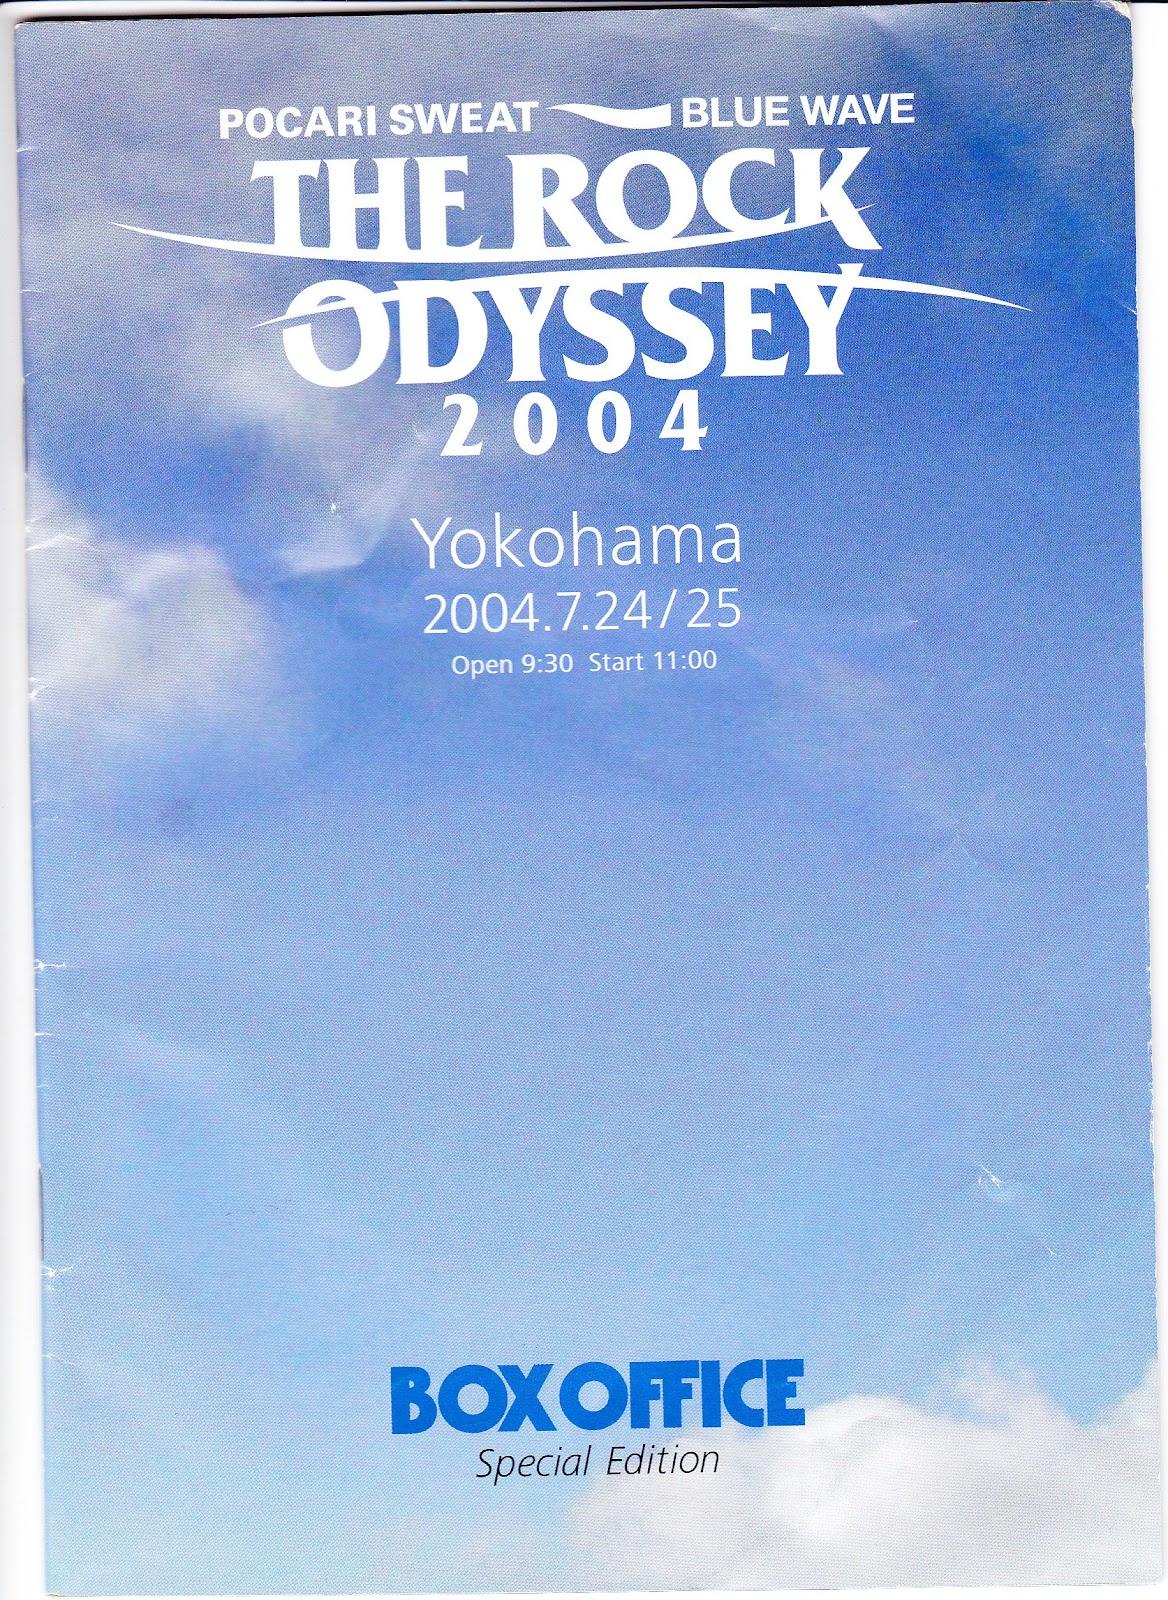 http://1.bp.blogspot.com/-nEhsw8n20dg/T-CTvfJgEyI/AAAAAAAAAnQ/3RYGnOYrnm8/s1600/Rock+Odyssey+Programme+Japan+2004.jpg